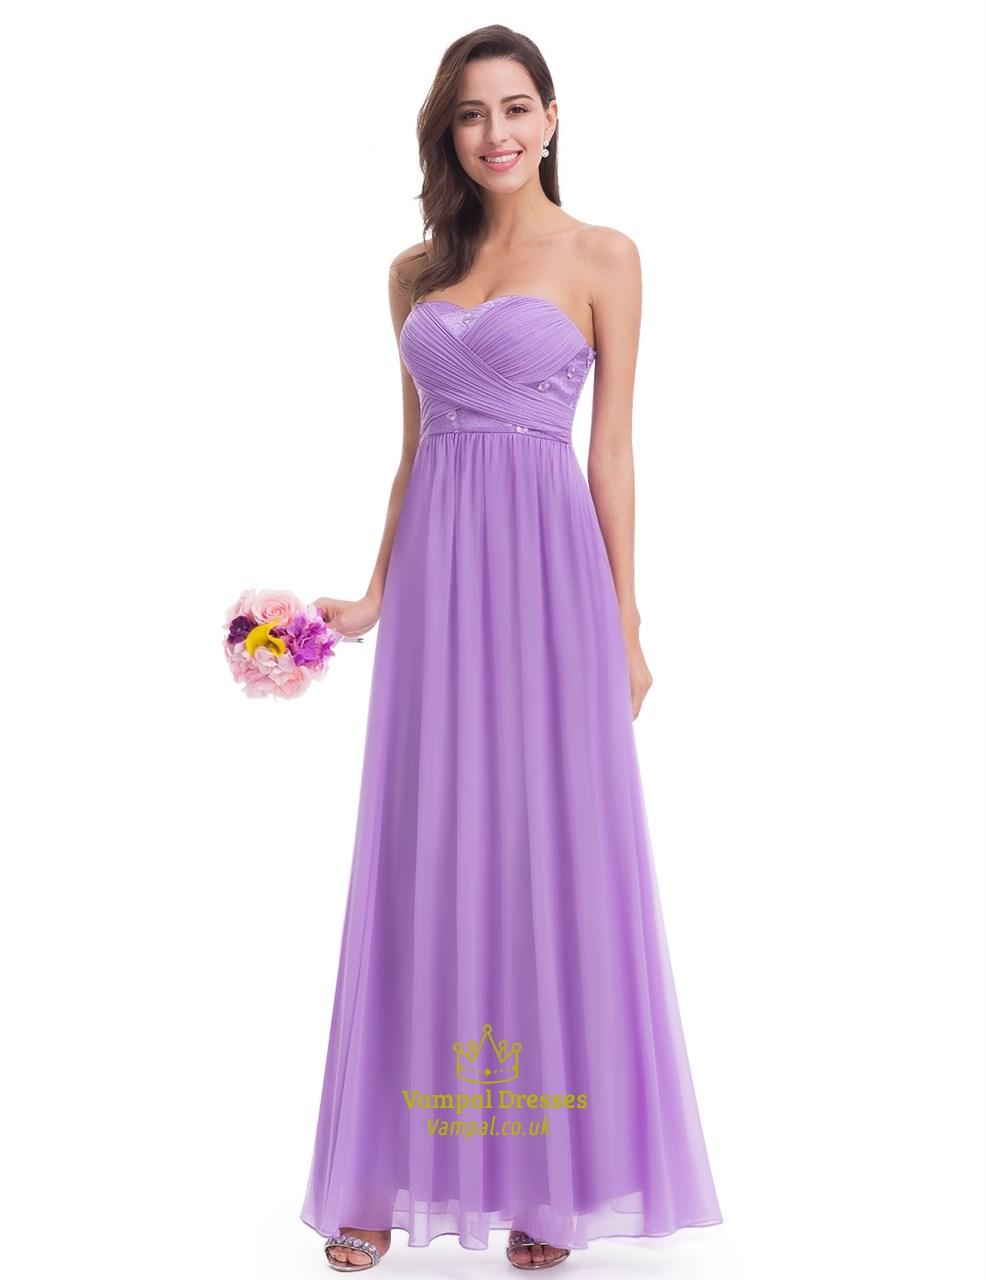 Elegant Lavender Sleeveless Floor Length Chiffon Bridesmaid Dress ...